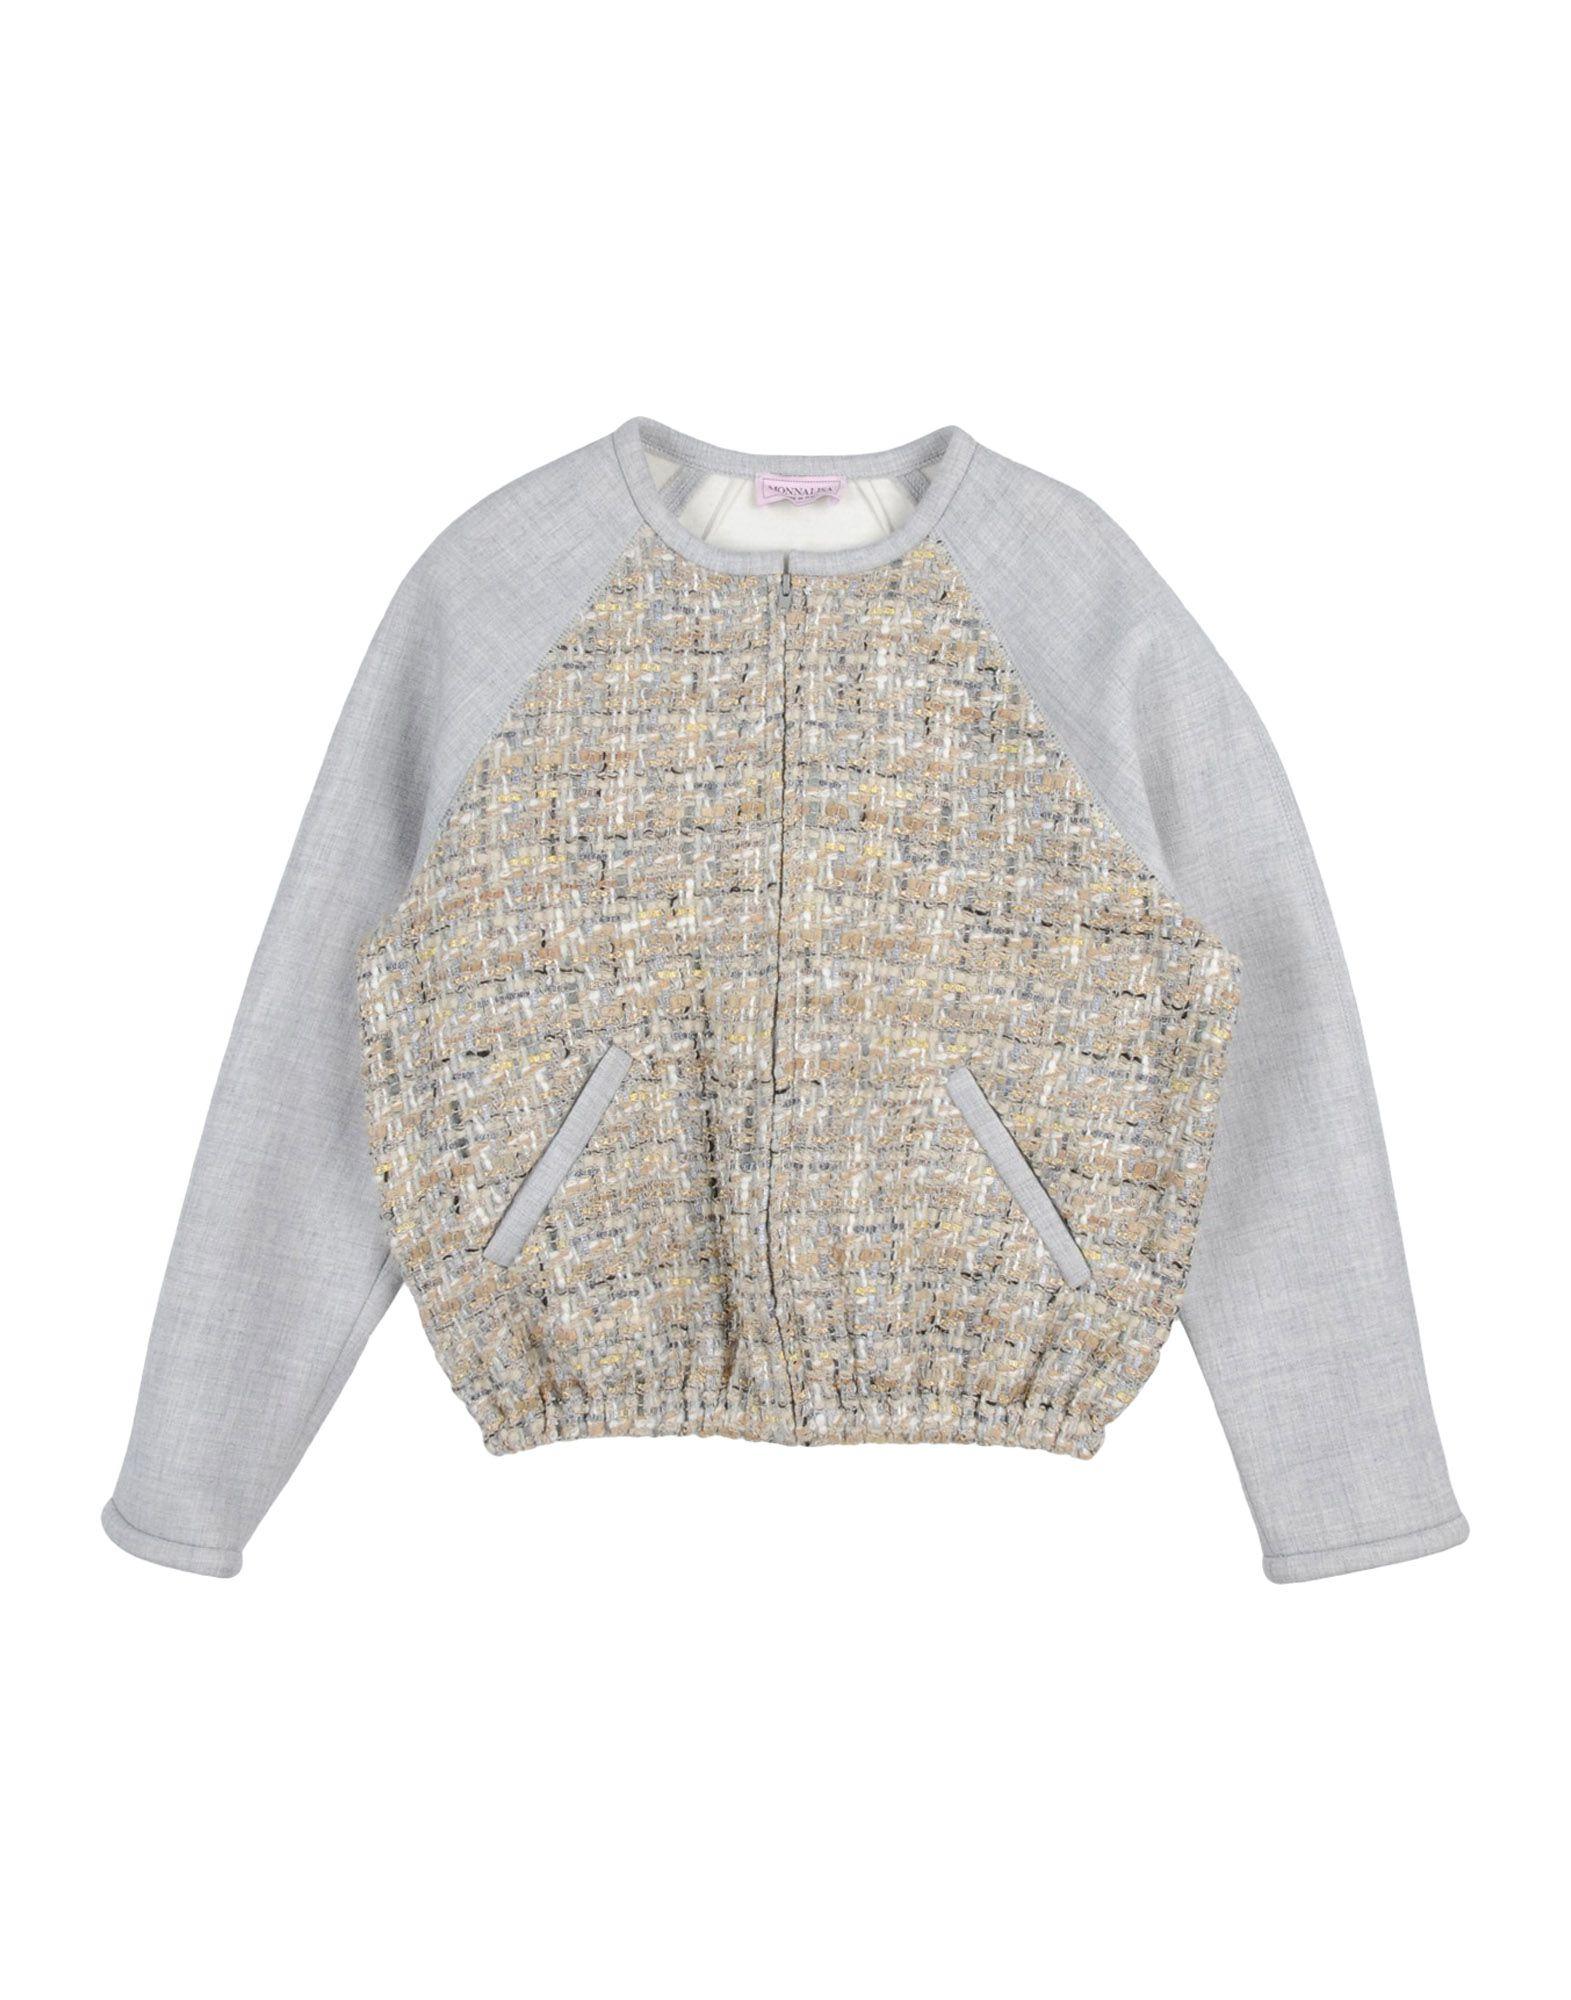 MONNALISA Sweatshirt in Light Grey